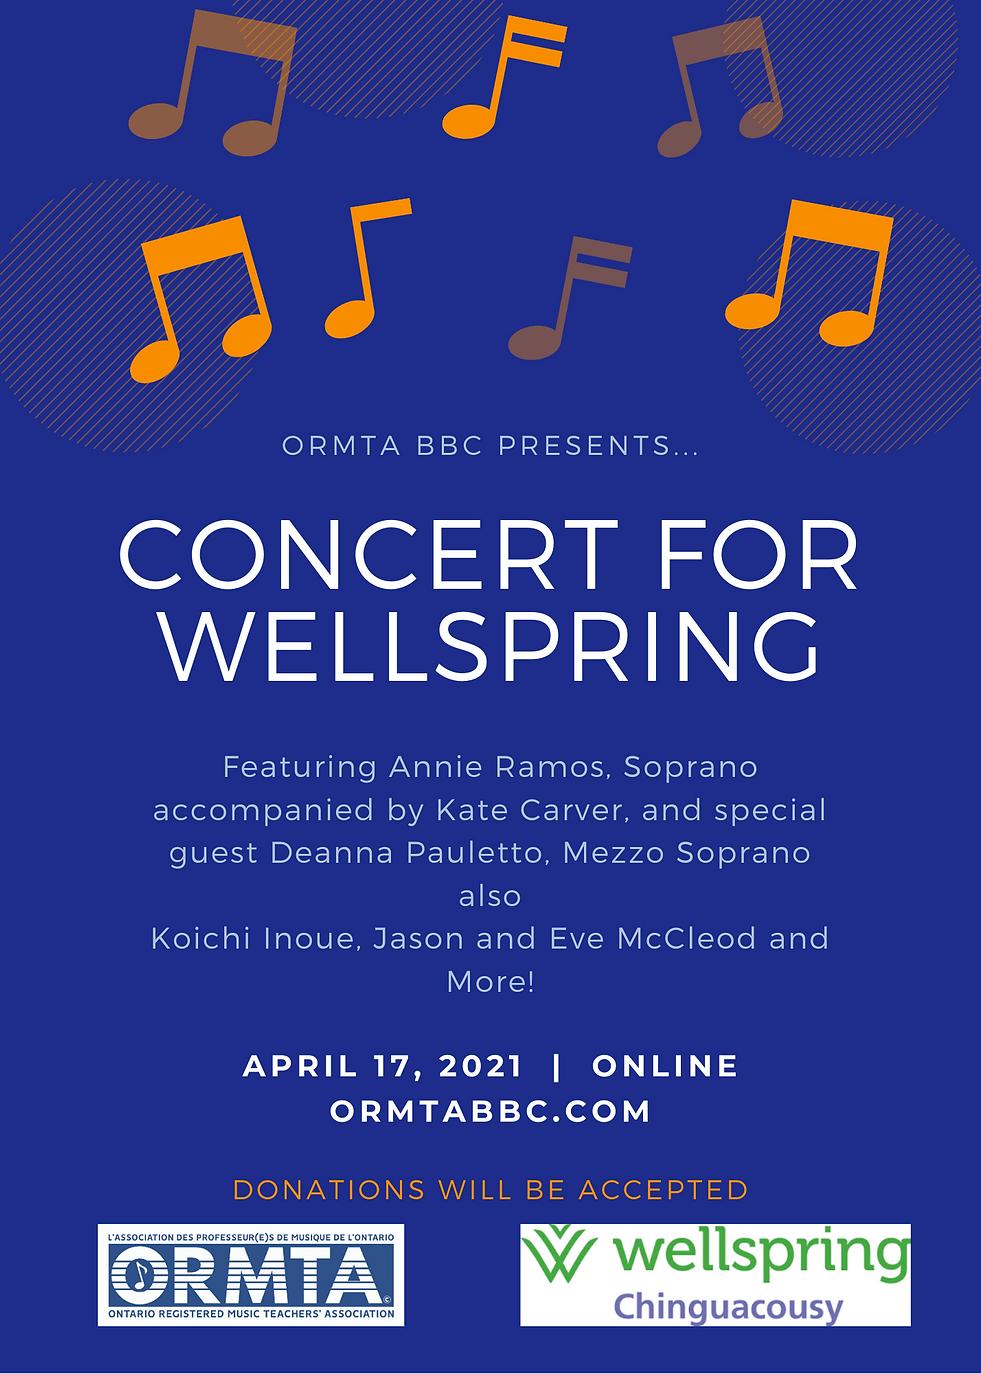 ORMTA wellspring png Flyer EDIT.png